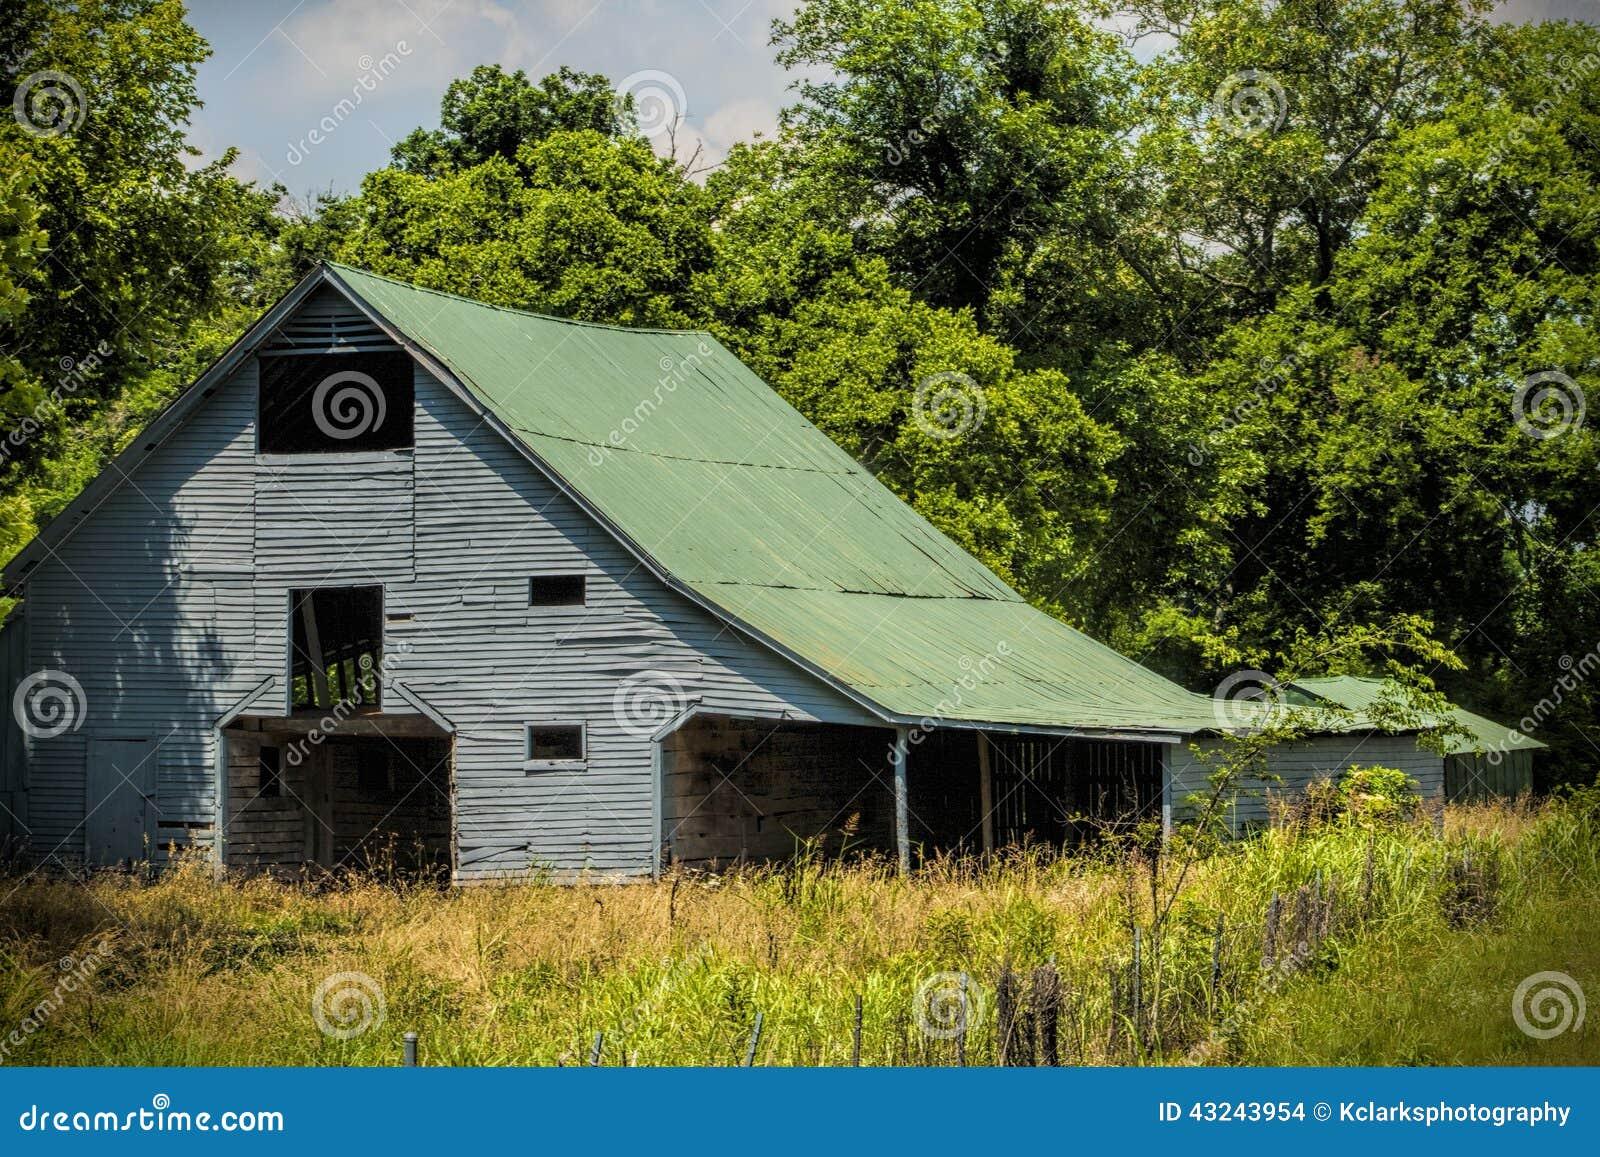 Hay storage pole barn design rachael edwards for Hay pole barns